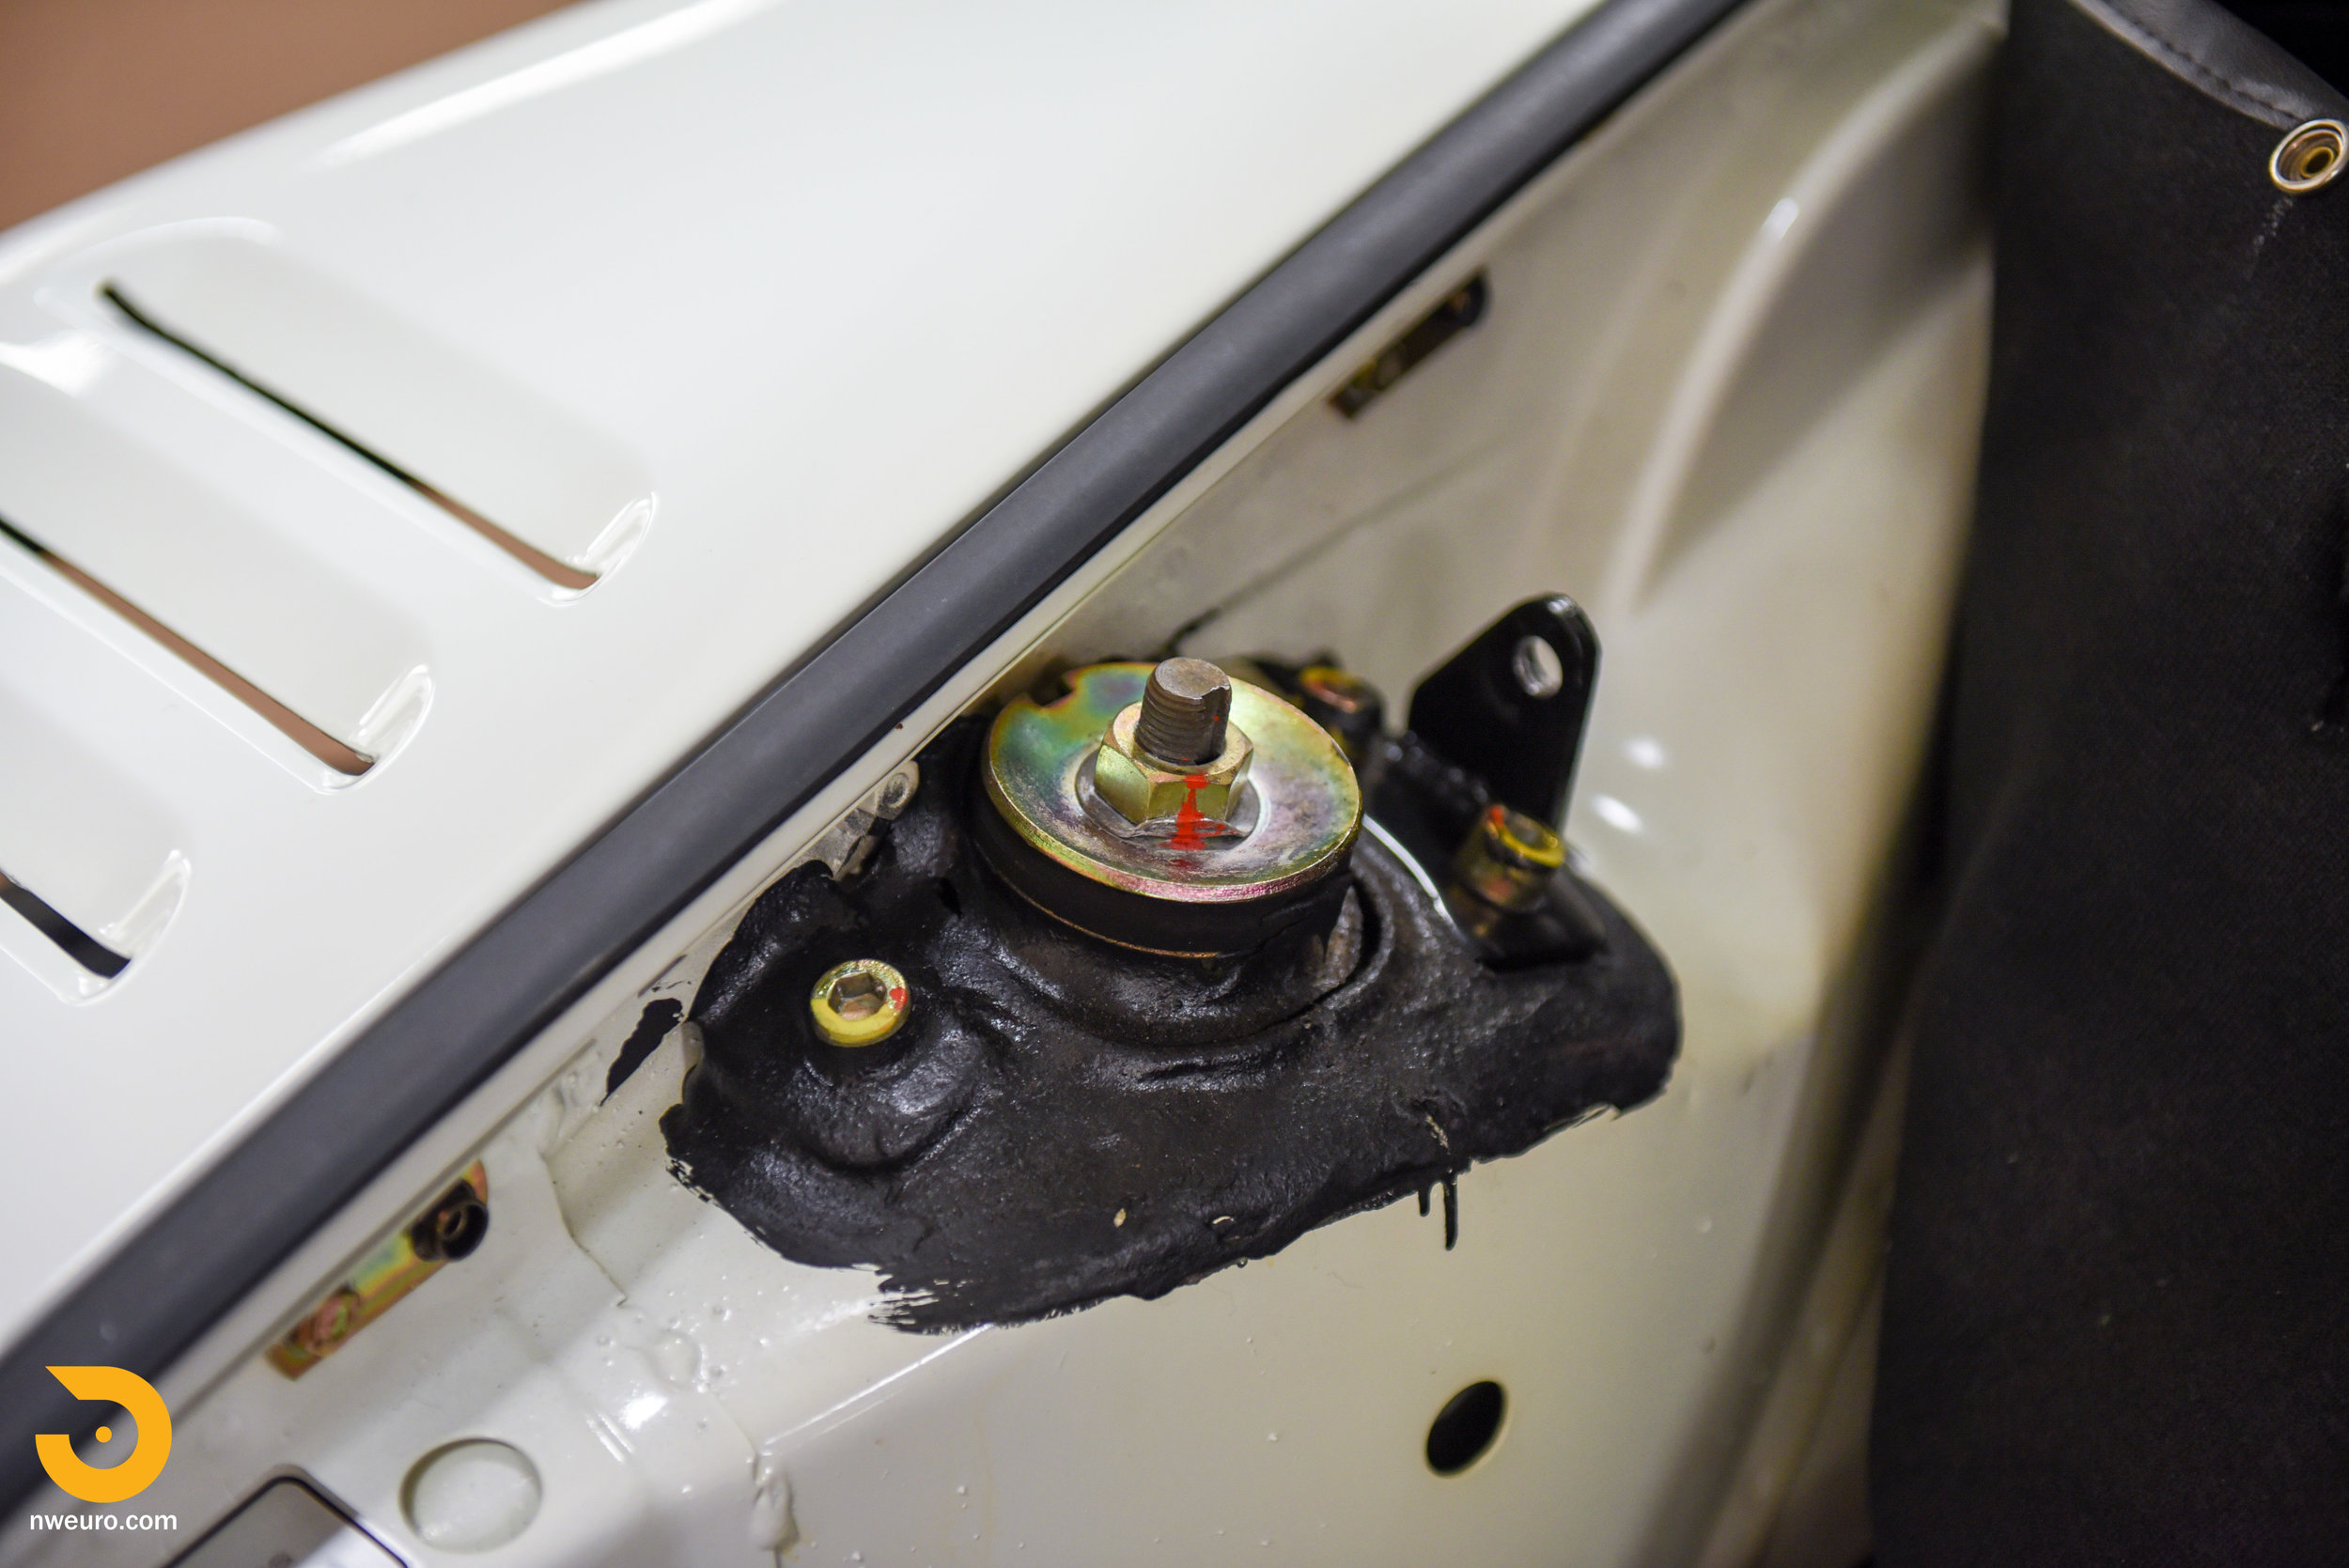 1987 Porsche 930 Slant Nose Cab Details-30.jpg